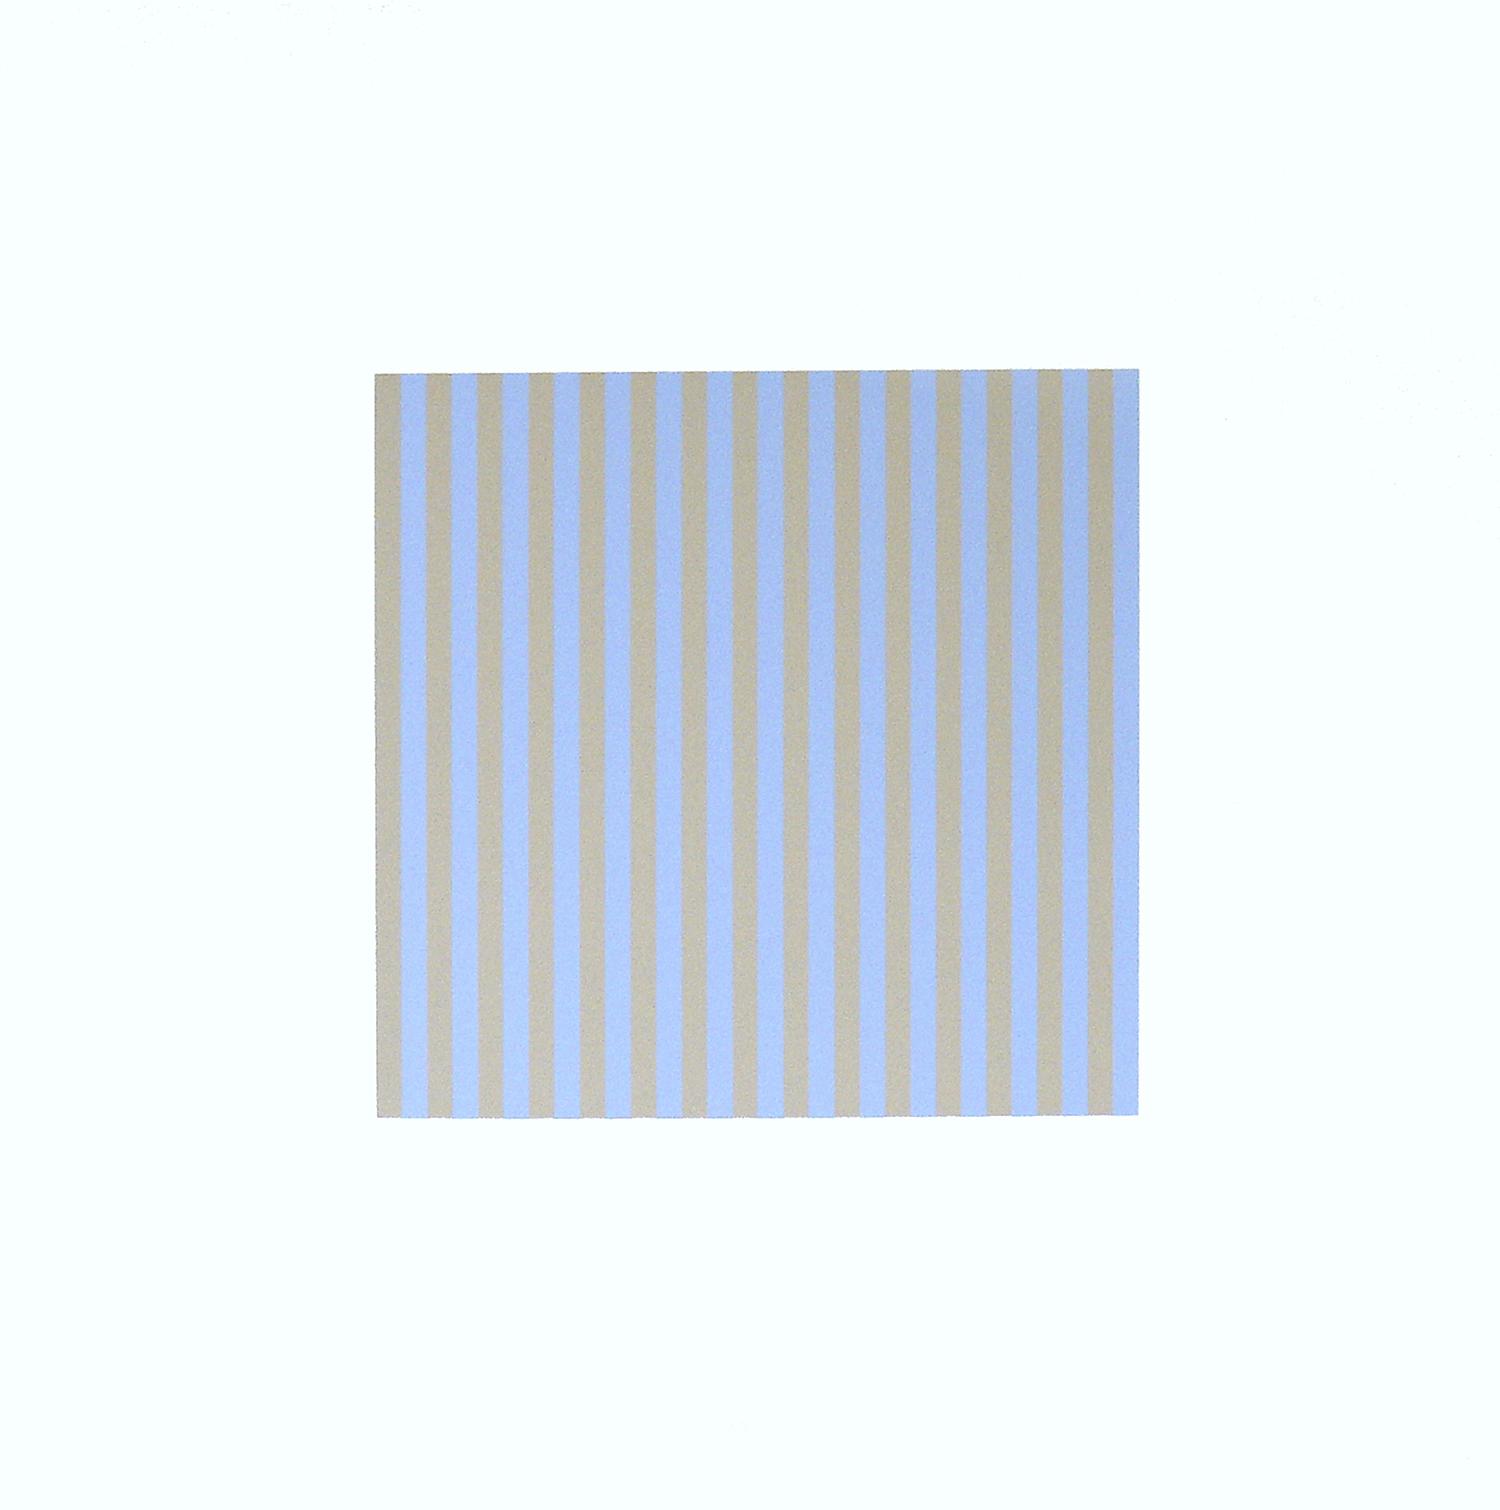 Michael Brick, Breathe    Date:  2008   Size (cm - unframed):  60 x 60   Technique:  Screenprint   Materials:  Somerset 410gsm   Edition size:  20   Publisher:  The Print Studio   Copyright:  The Artist & The Print Studio    P.O.A.